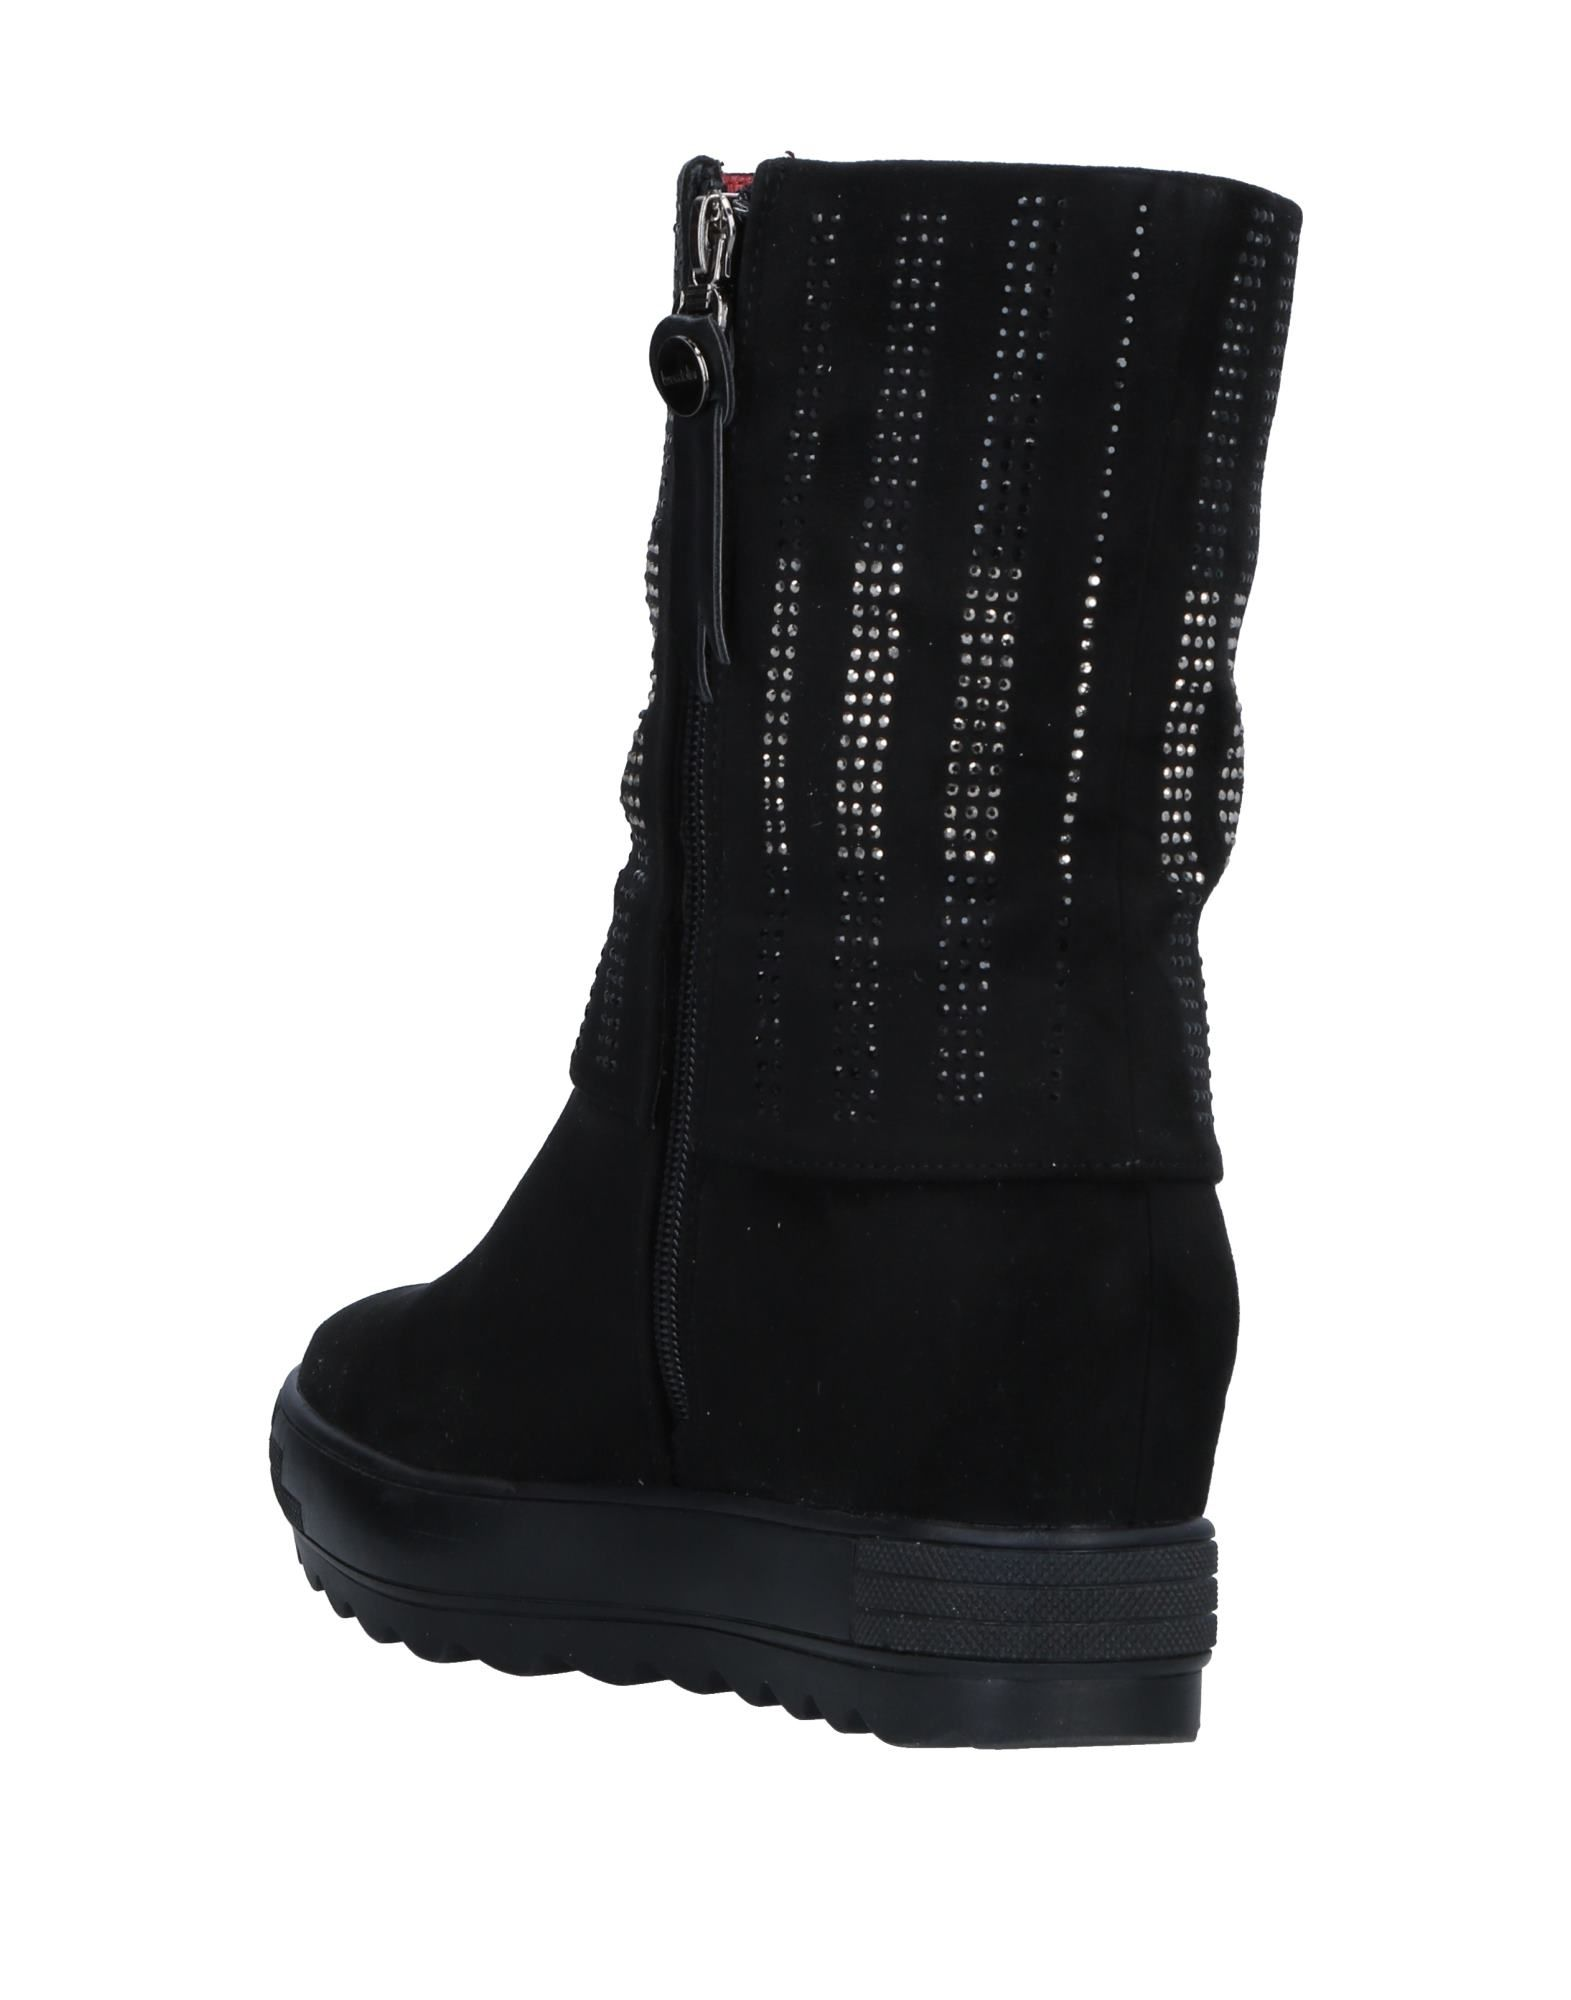 Tua Stiefelette By Braccialini Stiefelette Tua Damen  11526240PE Gute Qualität beliebte Schuhe 910881